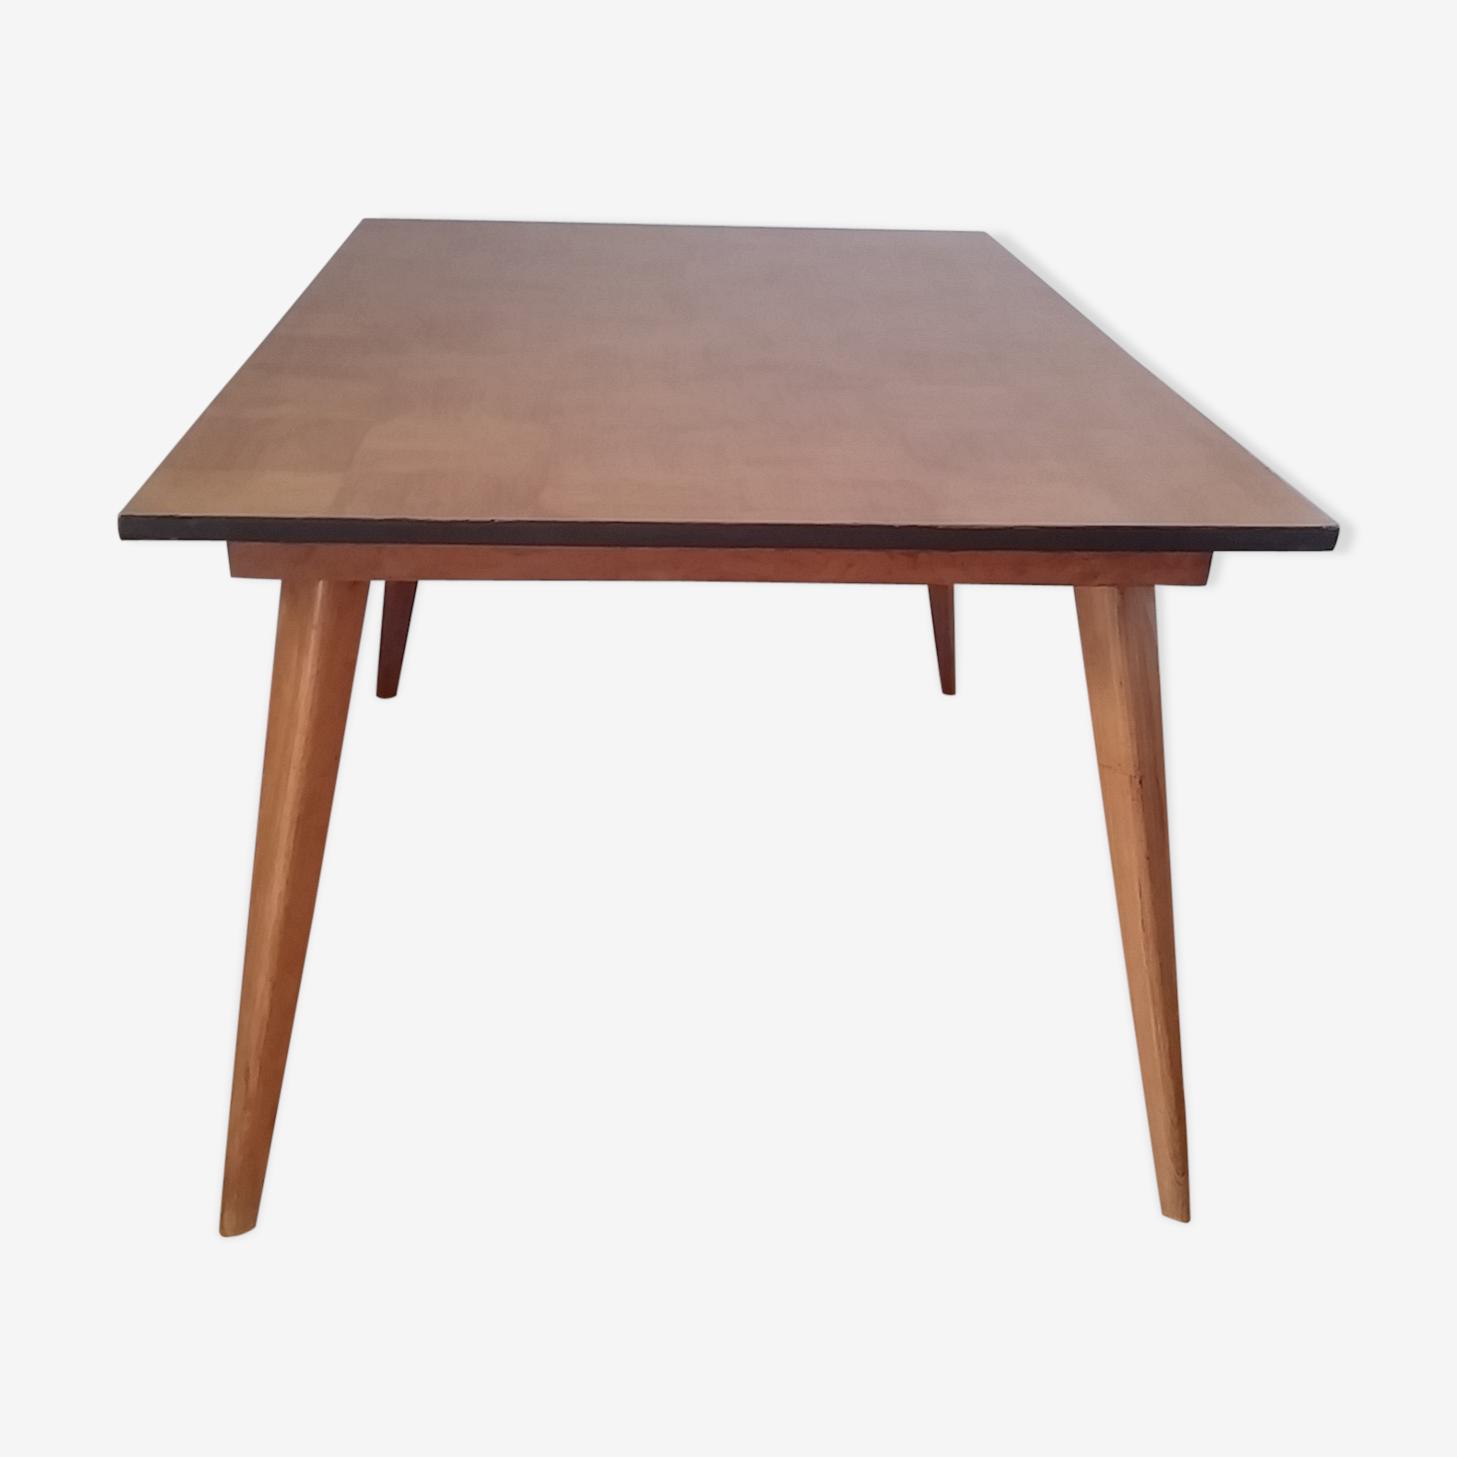 Rectangular wooden scandinavian table